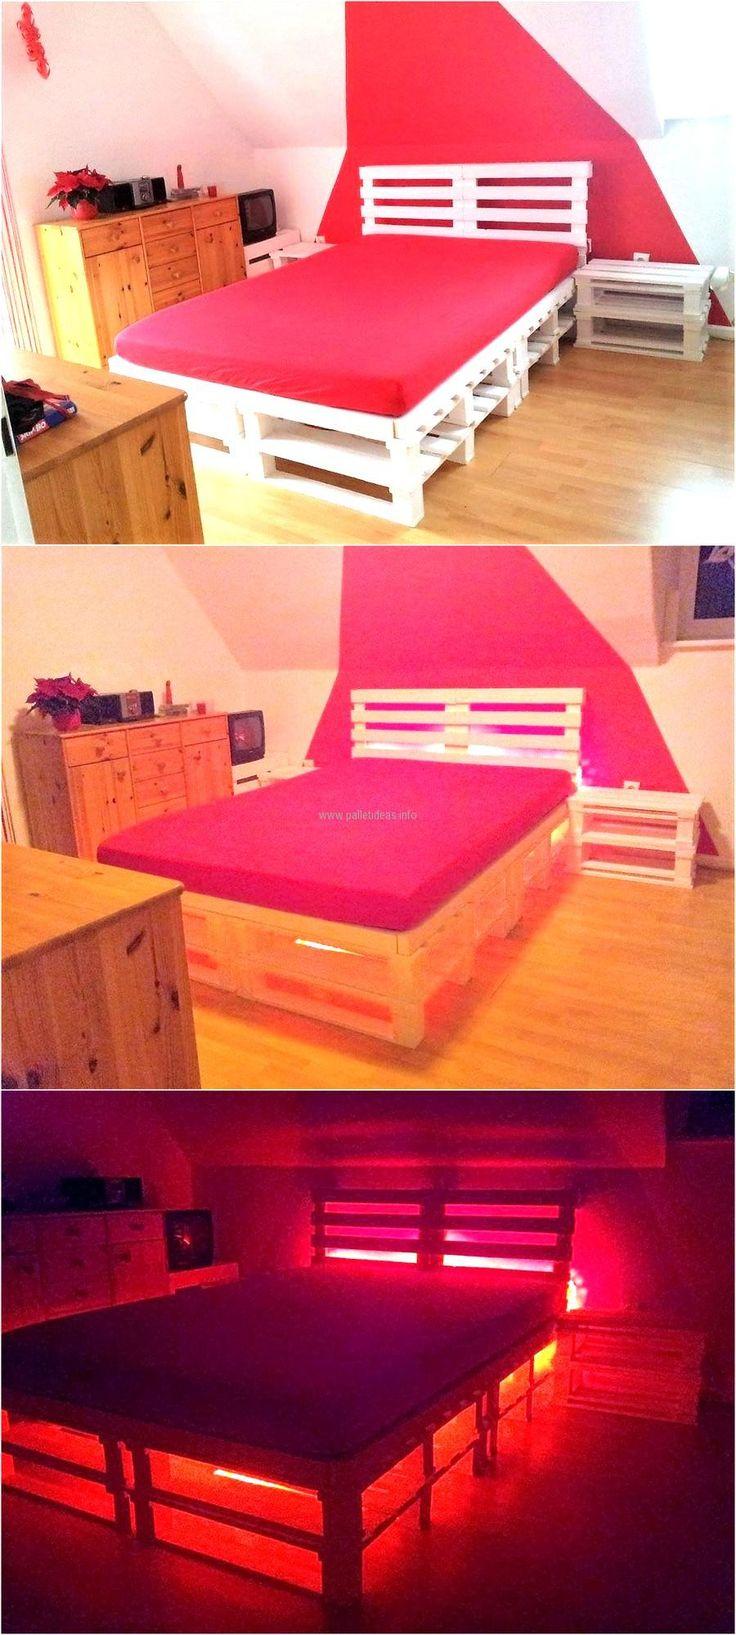 repurposed-wooden-pallet-bed